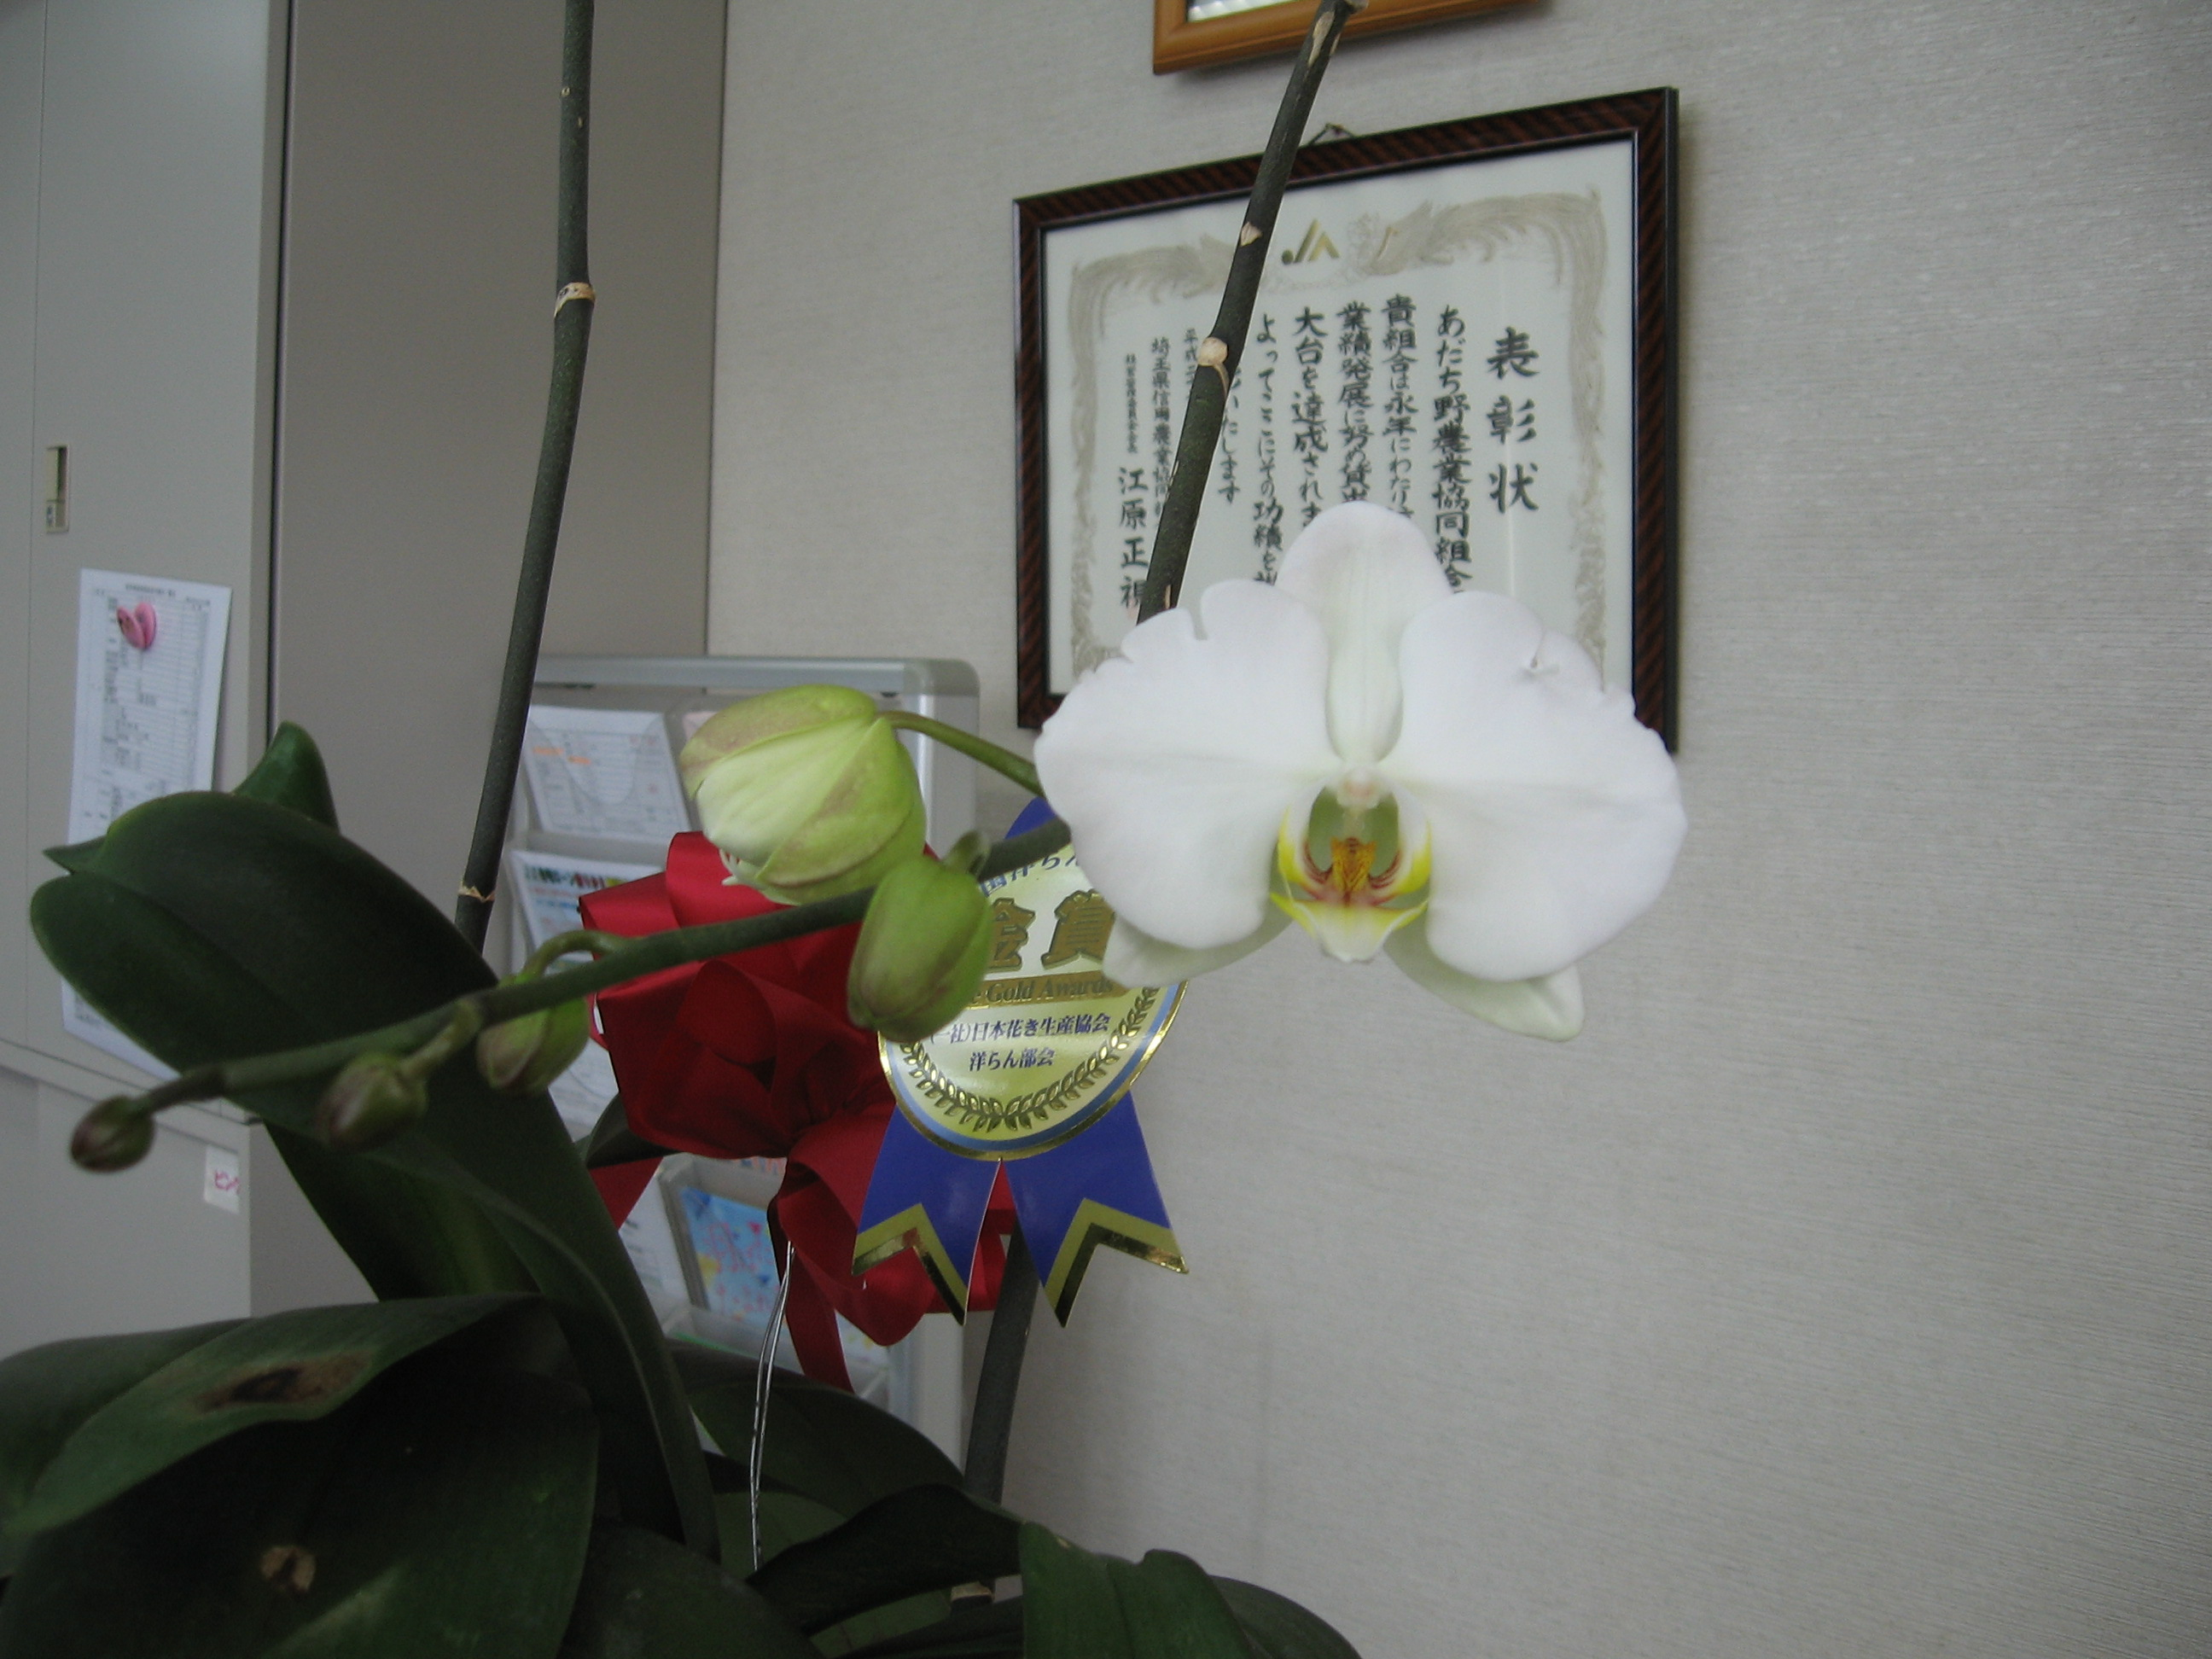 P14左下 候補・通信員(北部融資推進課)・洋蘭が開花!!